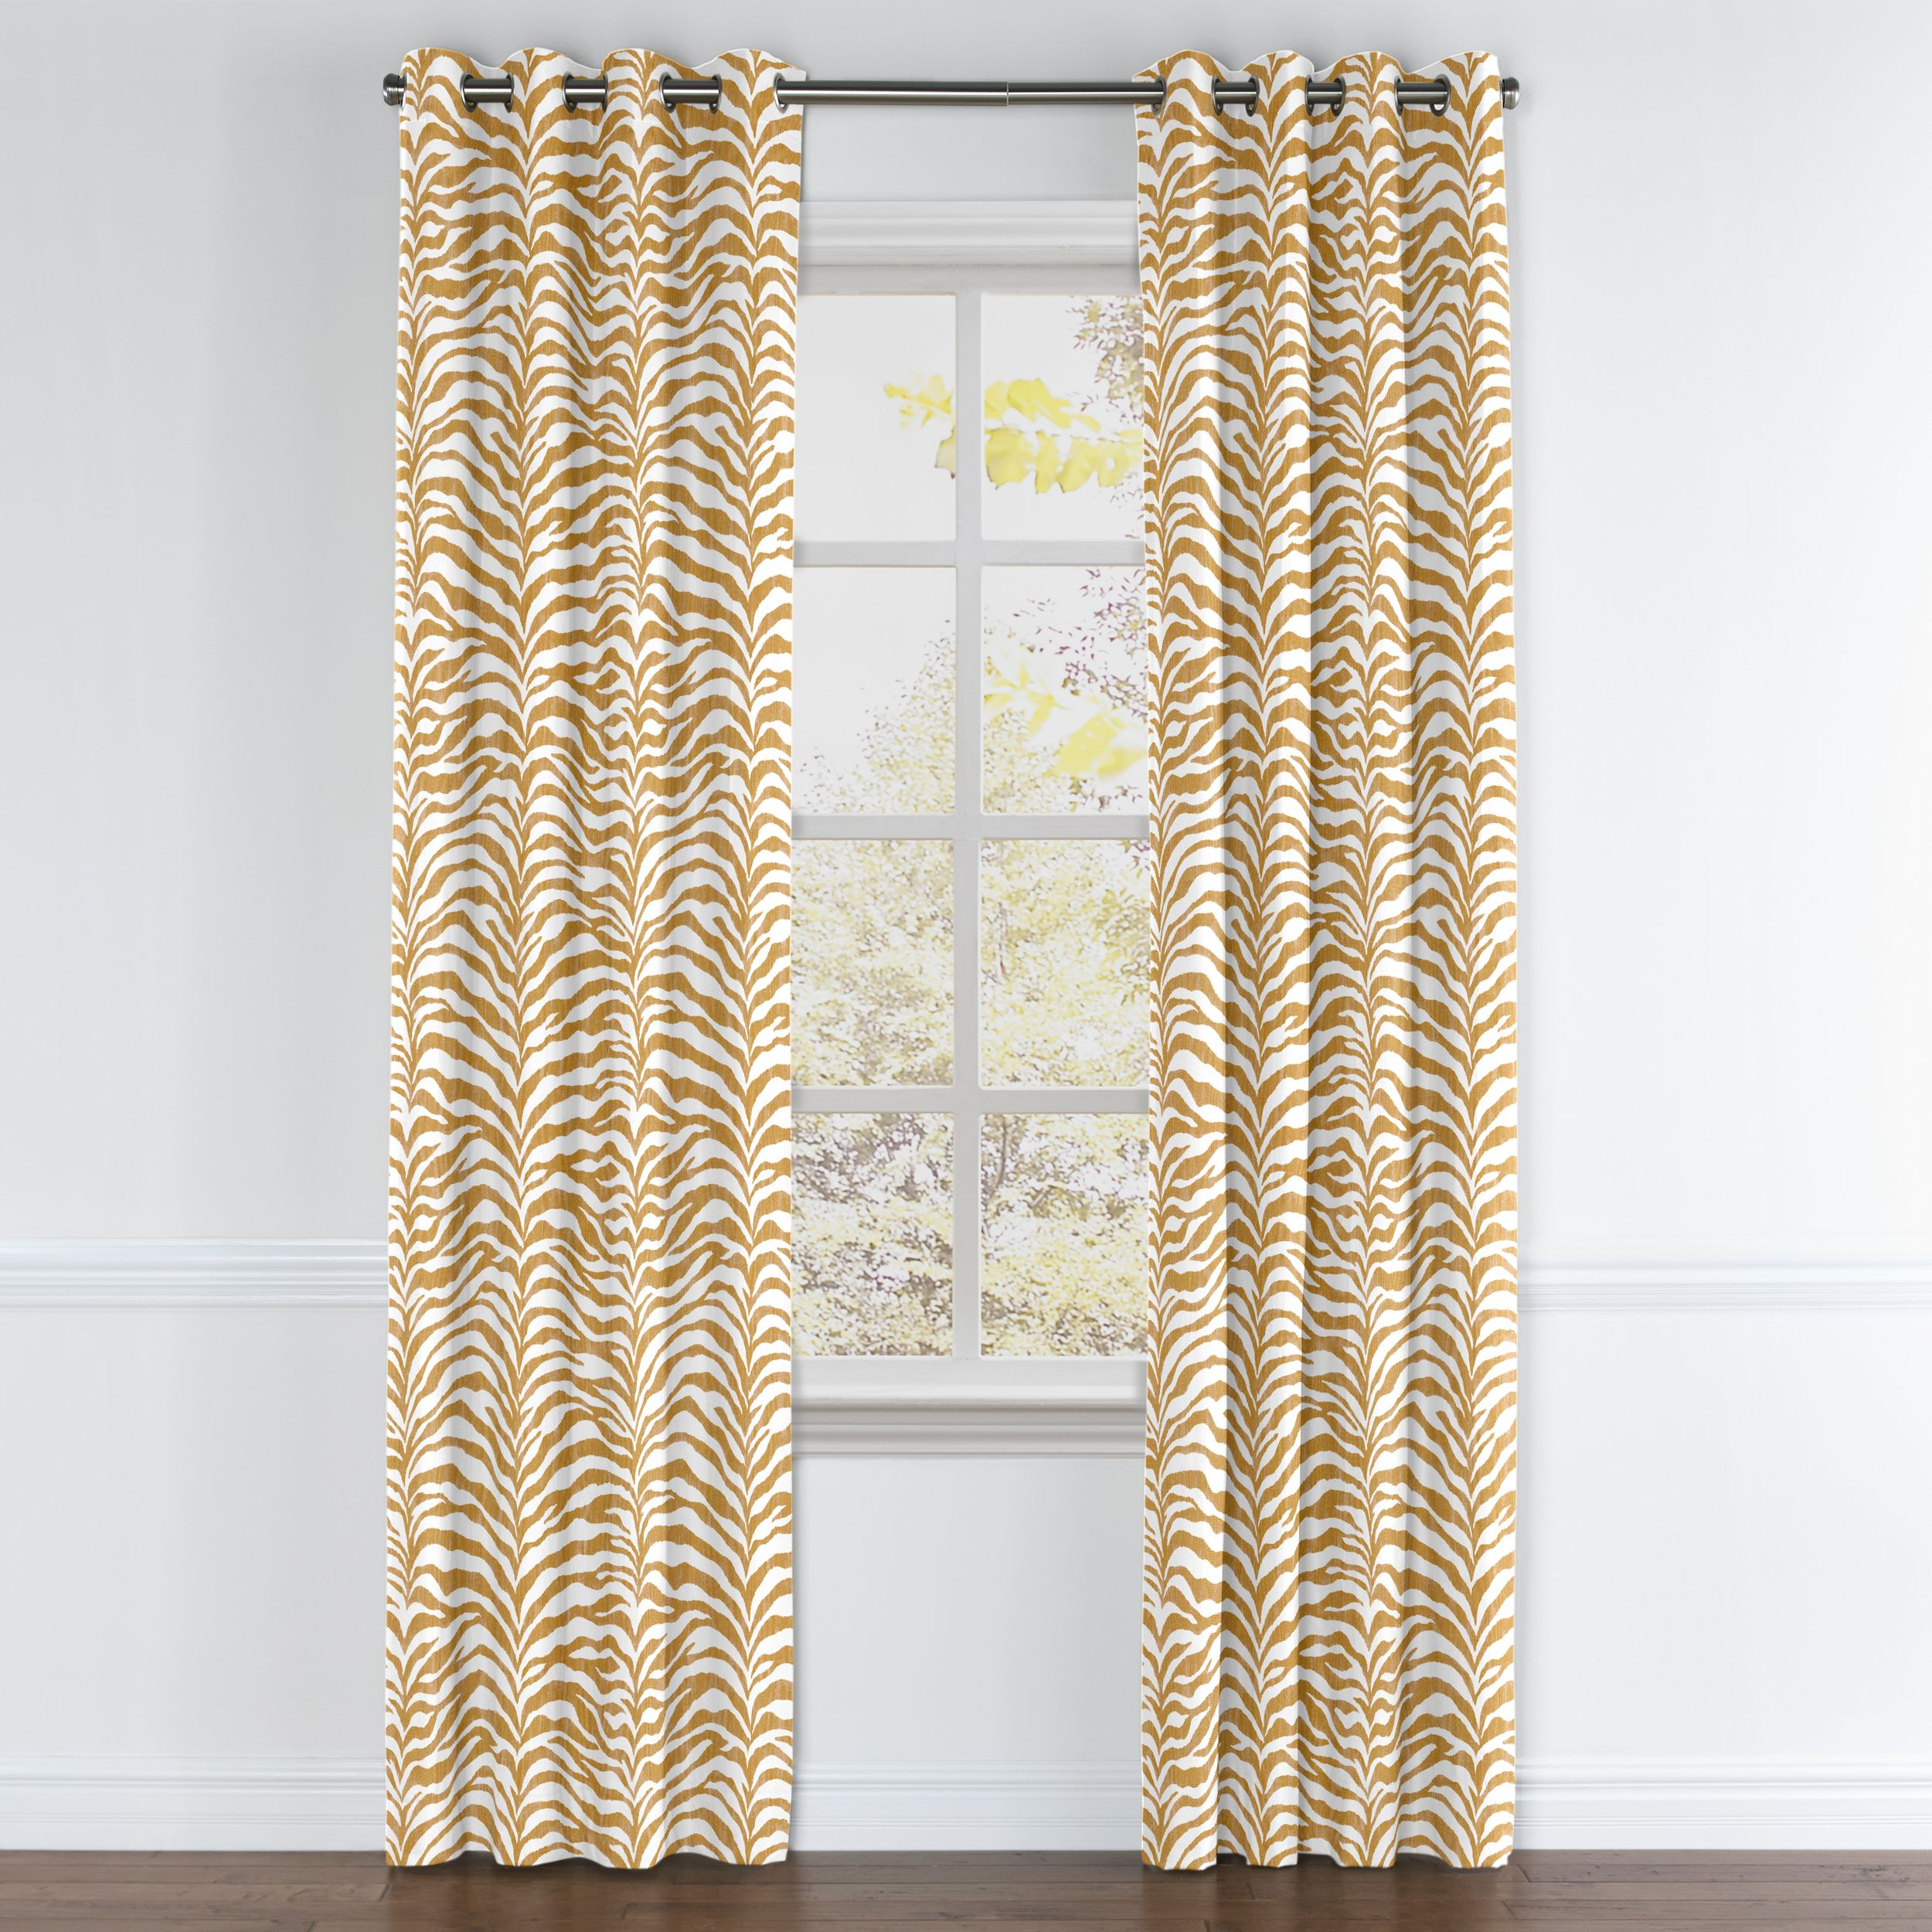 Eyelot/Grommet Curtains - Dilshan Drapers | Beta